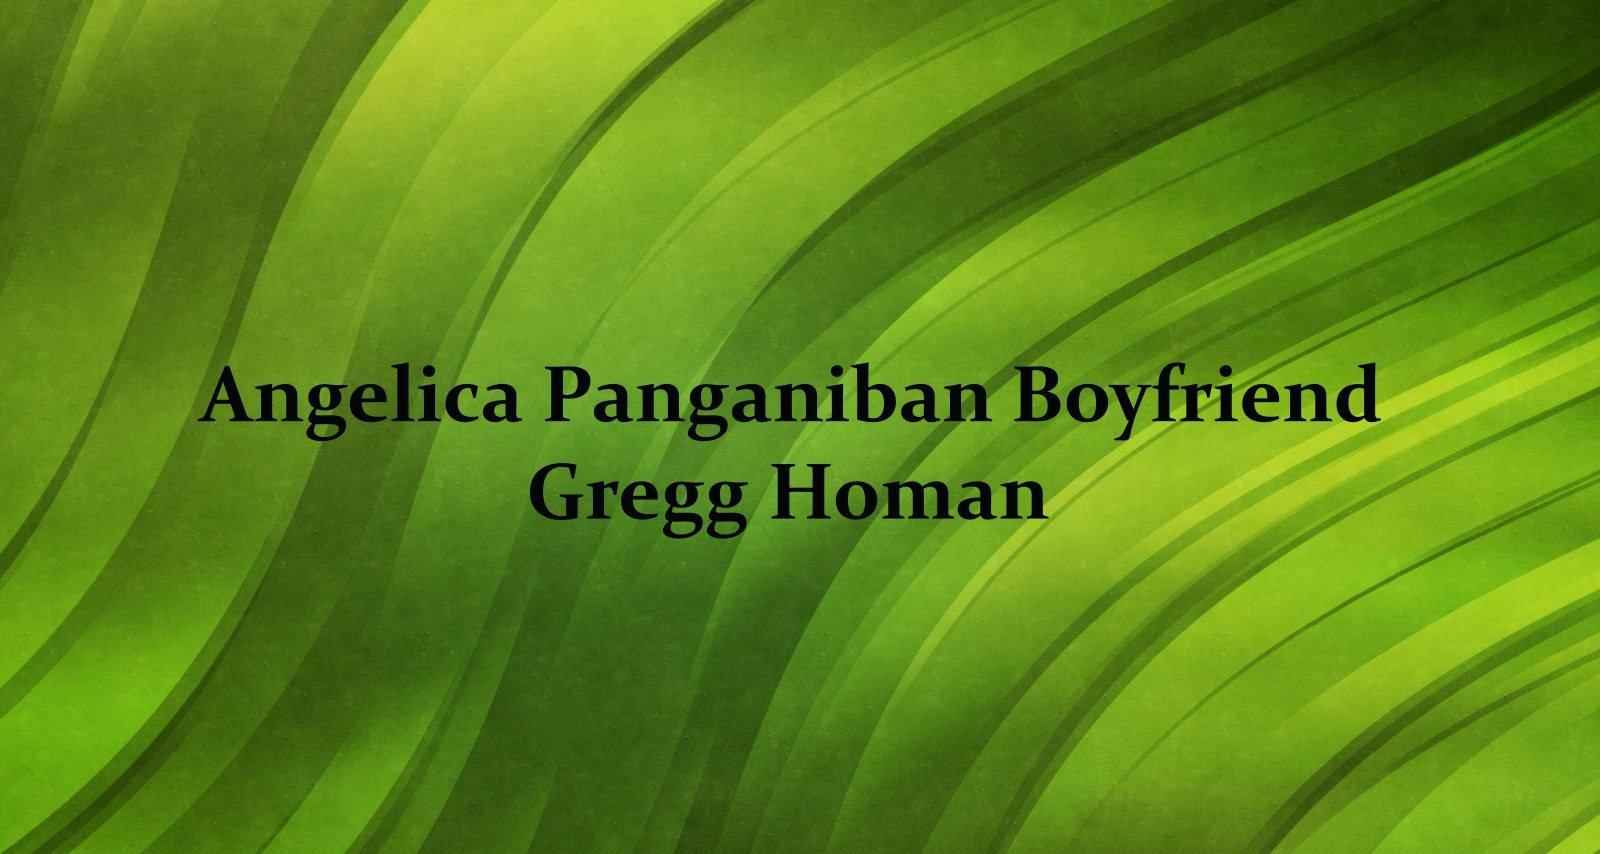 Gregg Homan, Angelica Panganiban Boyfriend